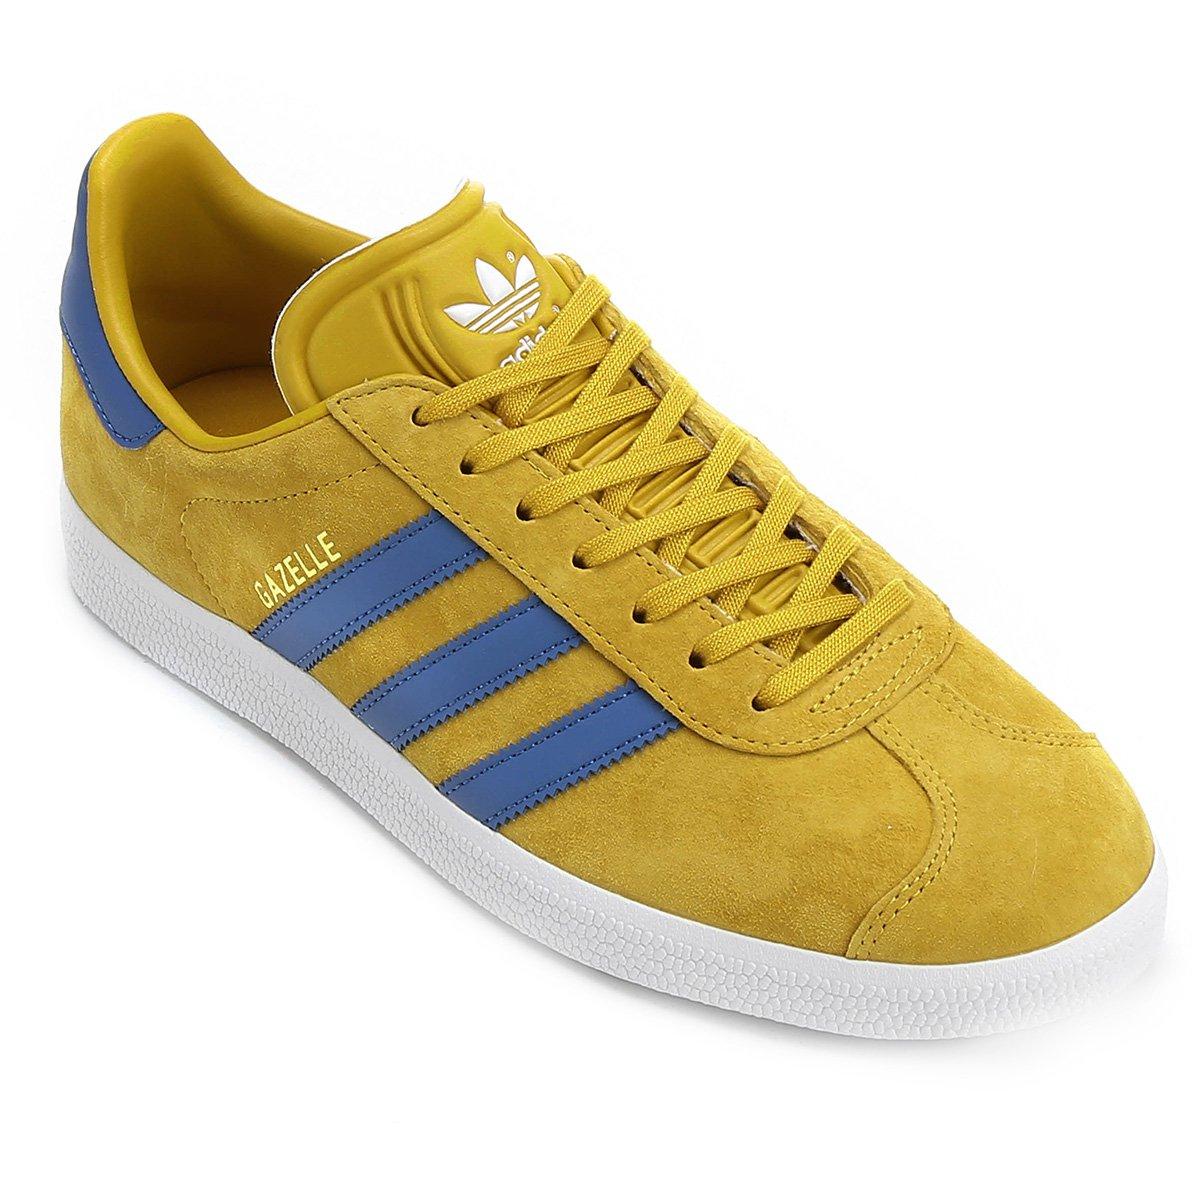 promo code 138f0 b594a Tênis Adidas Gazelle - Compre Agora  Netshoes